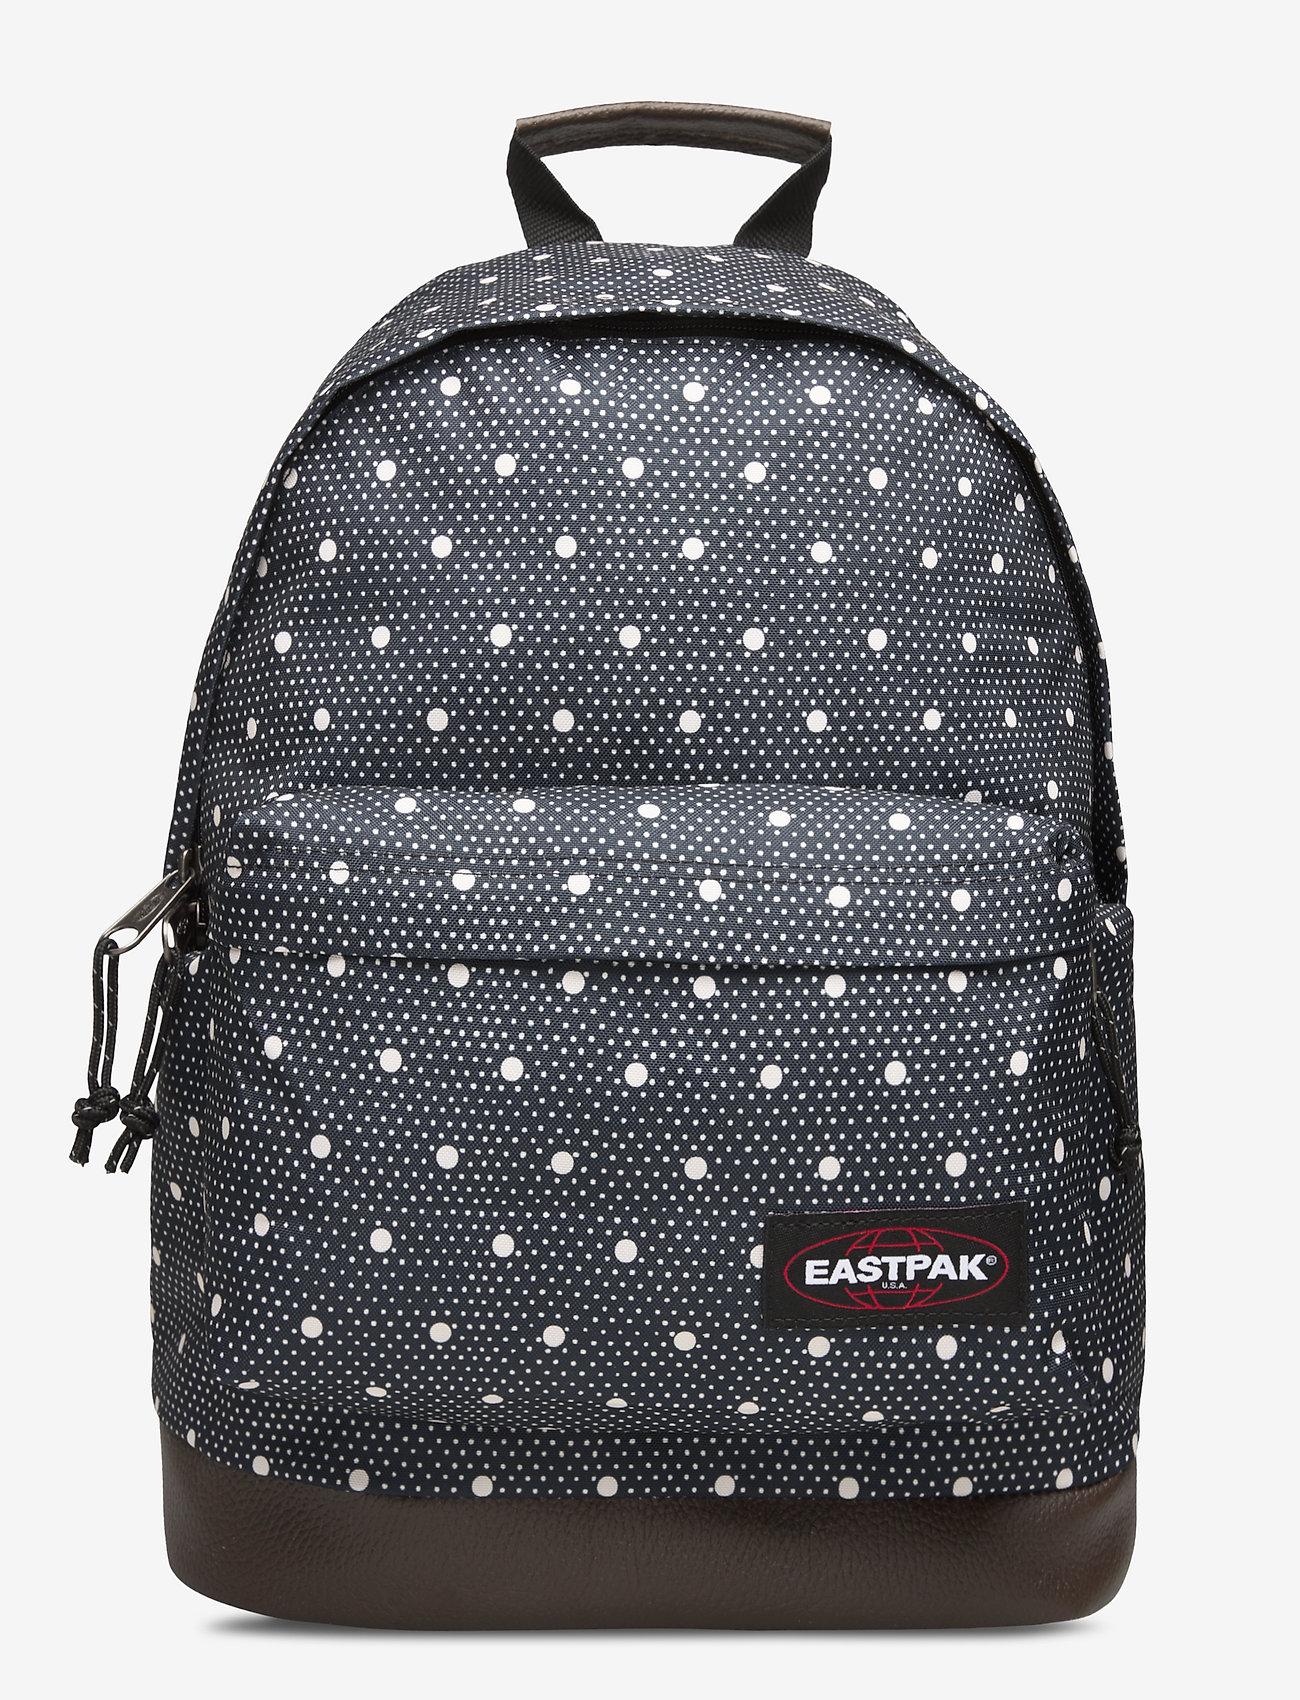 Eastpak - WYOMING - ryggsäckar - little dot - 0